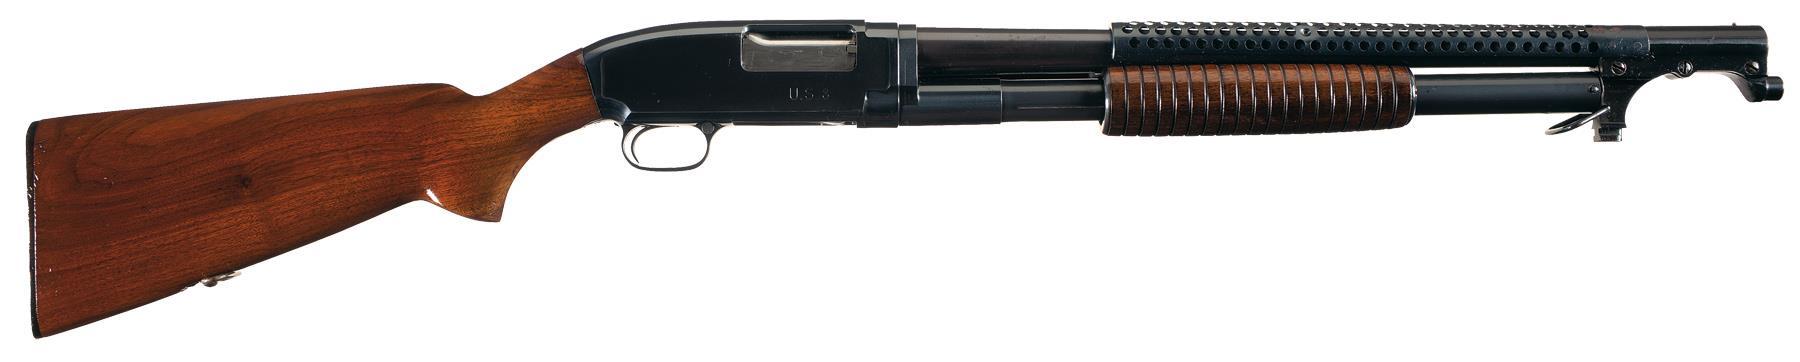 Rock Island Trench Gun